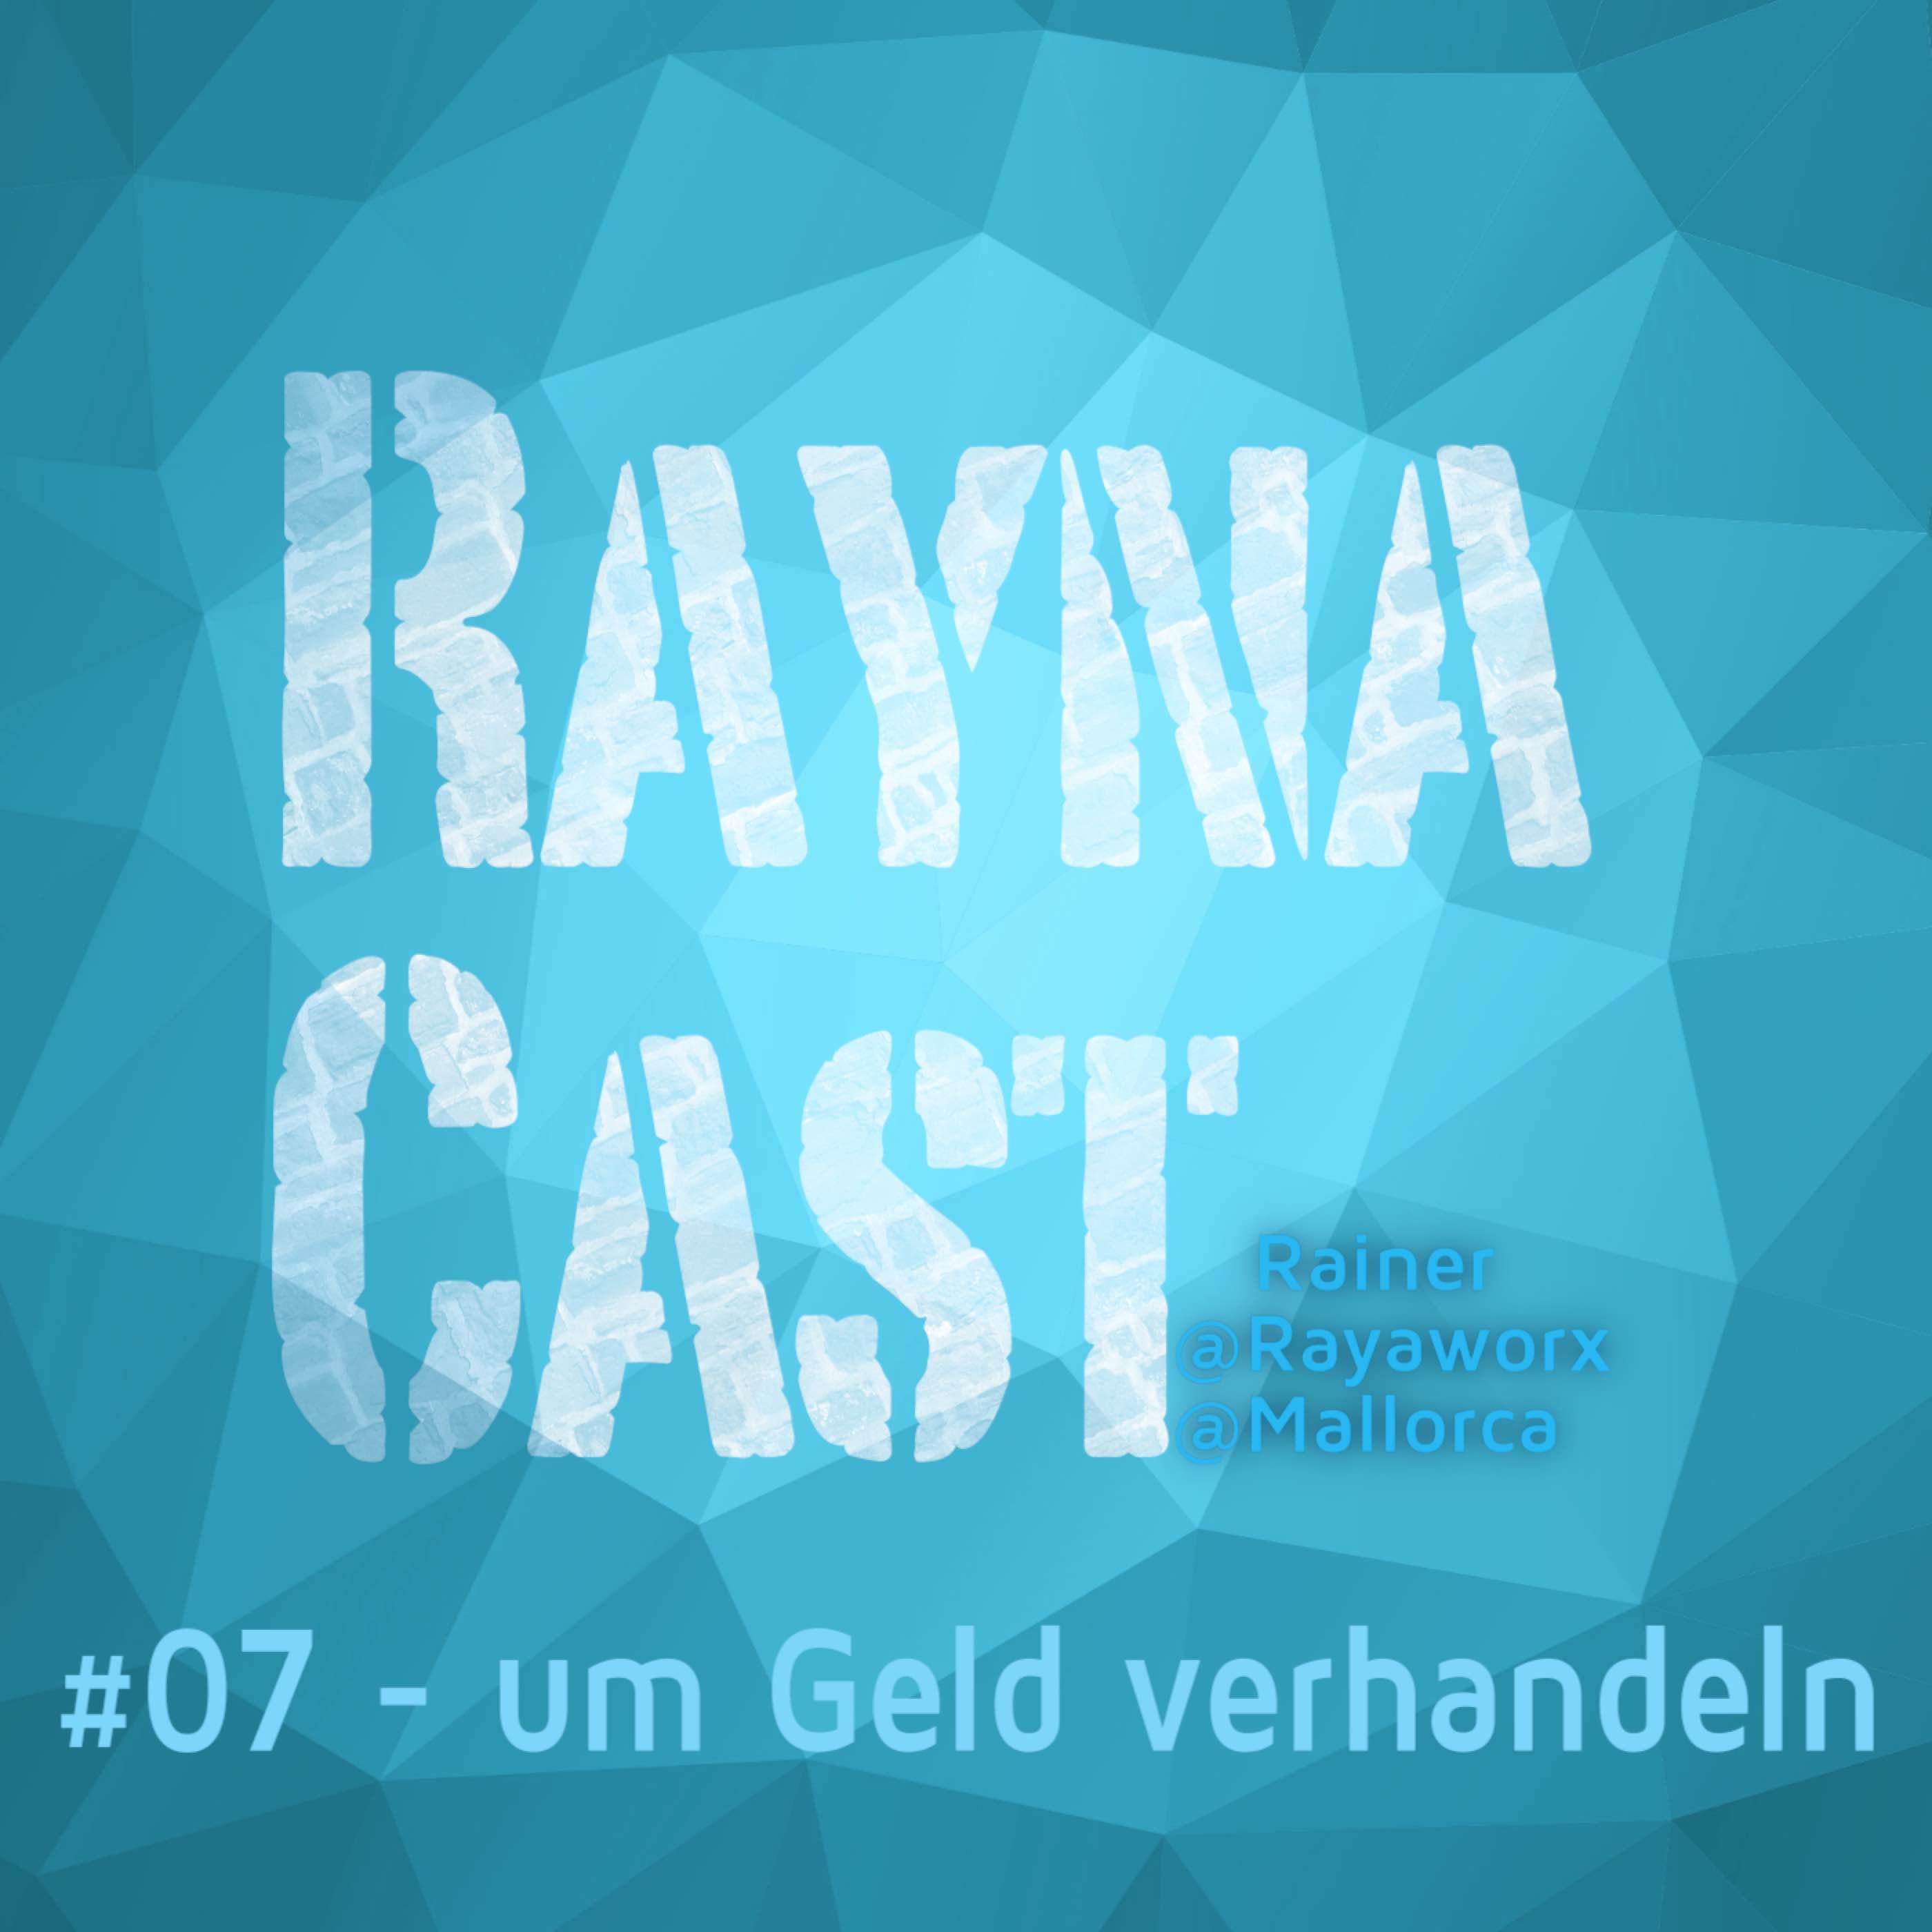 Um Geld verhandeln - RaynaCast 007